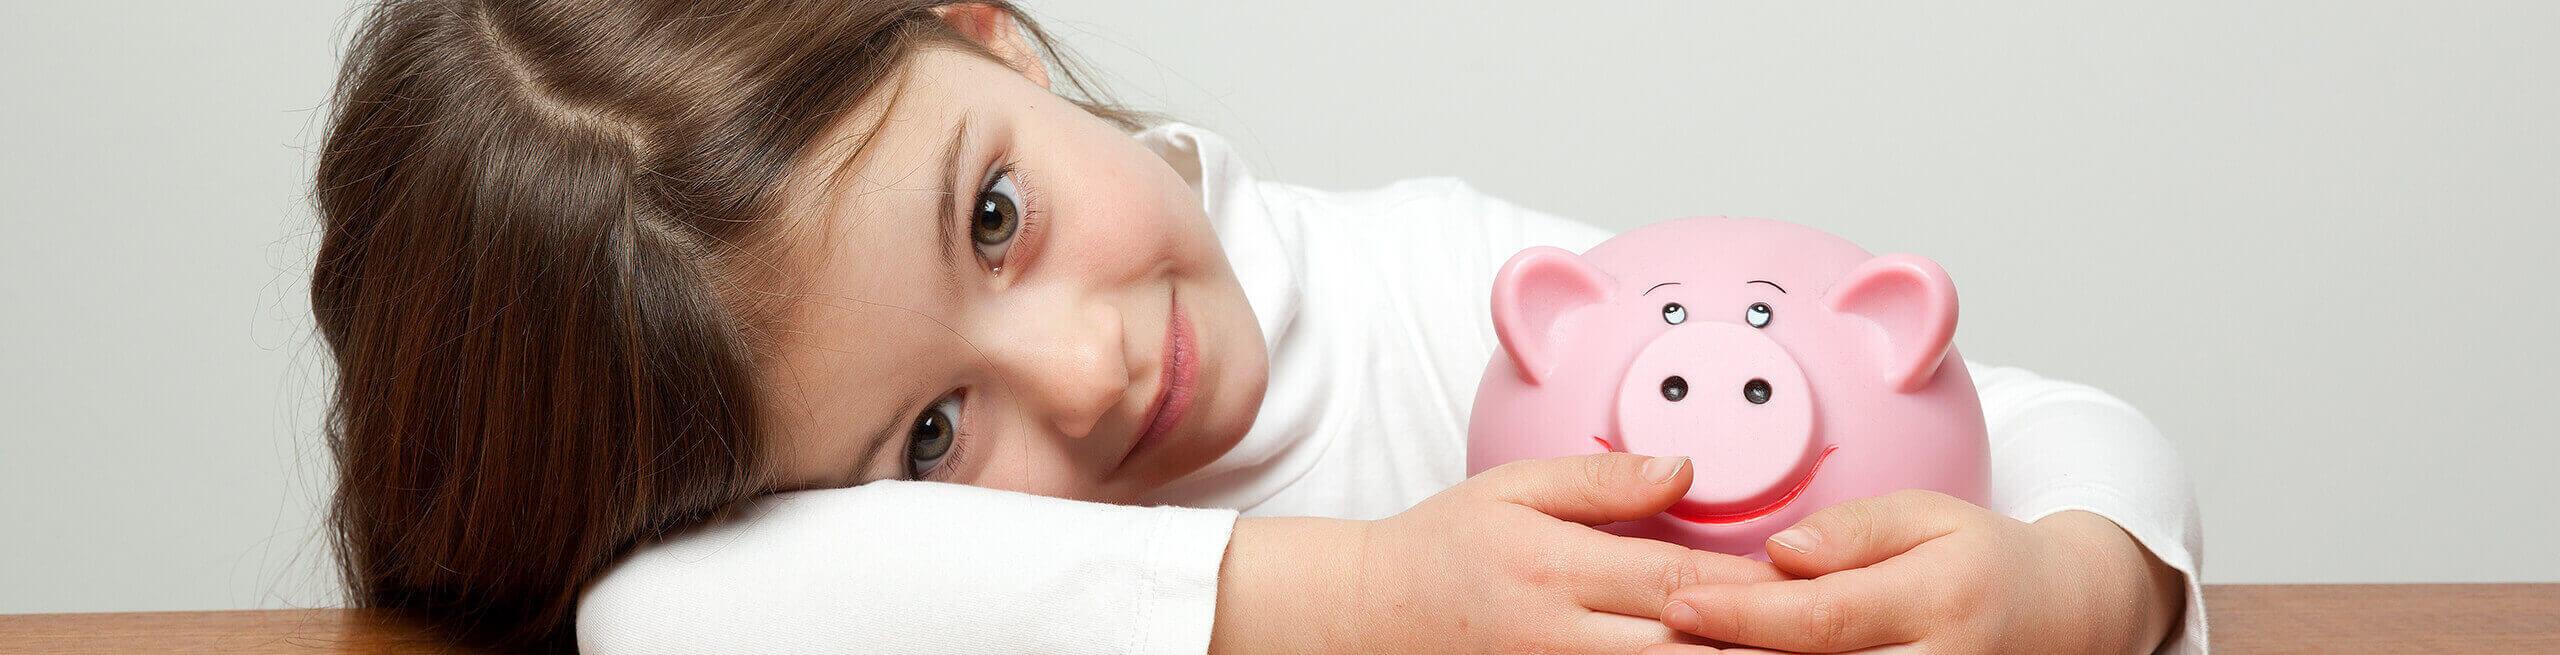 Saving money on dental services